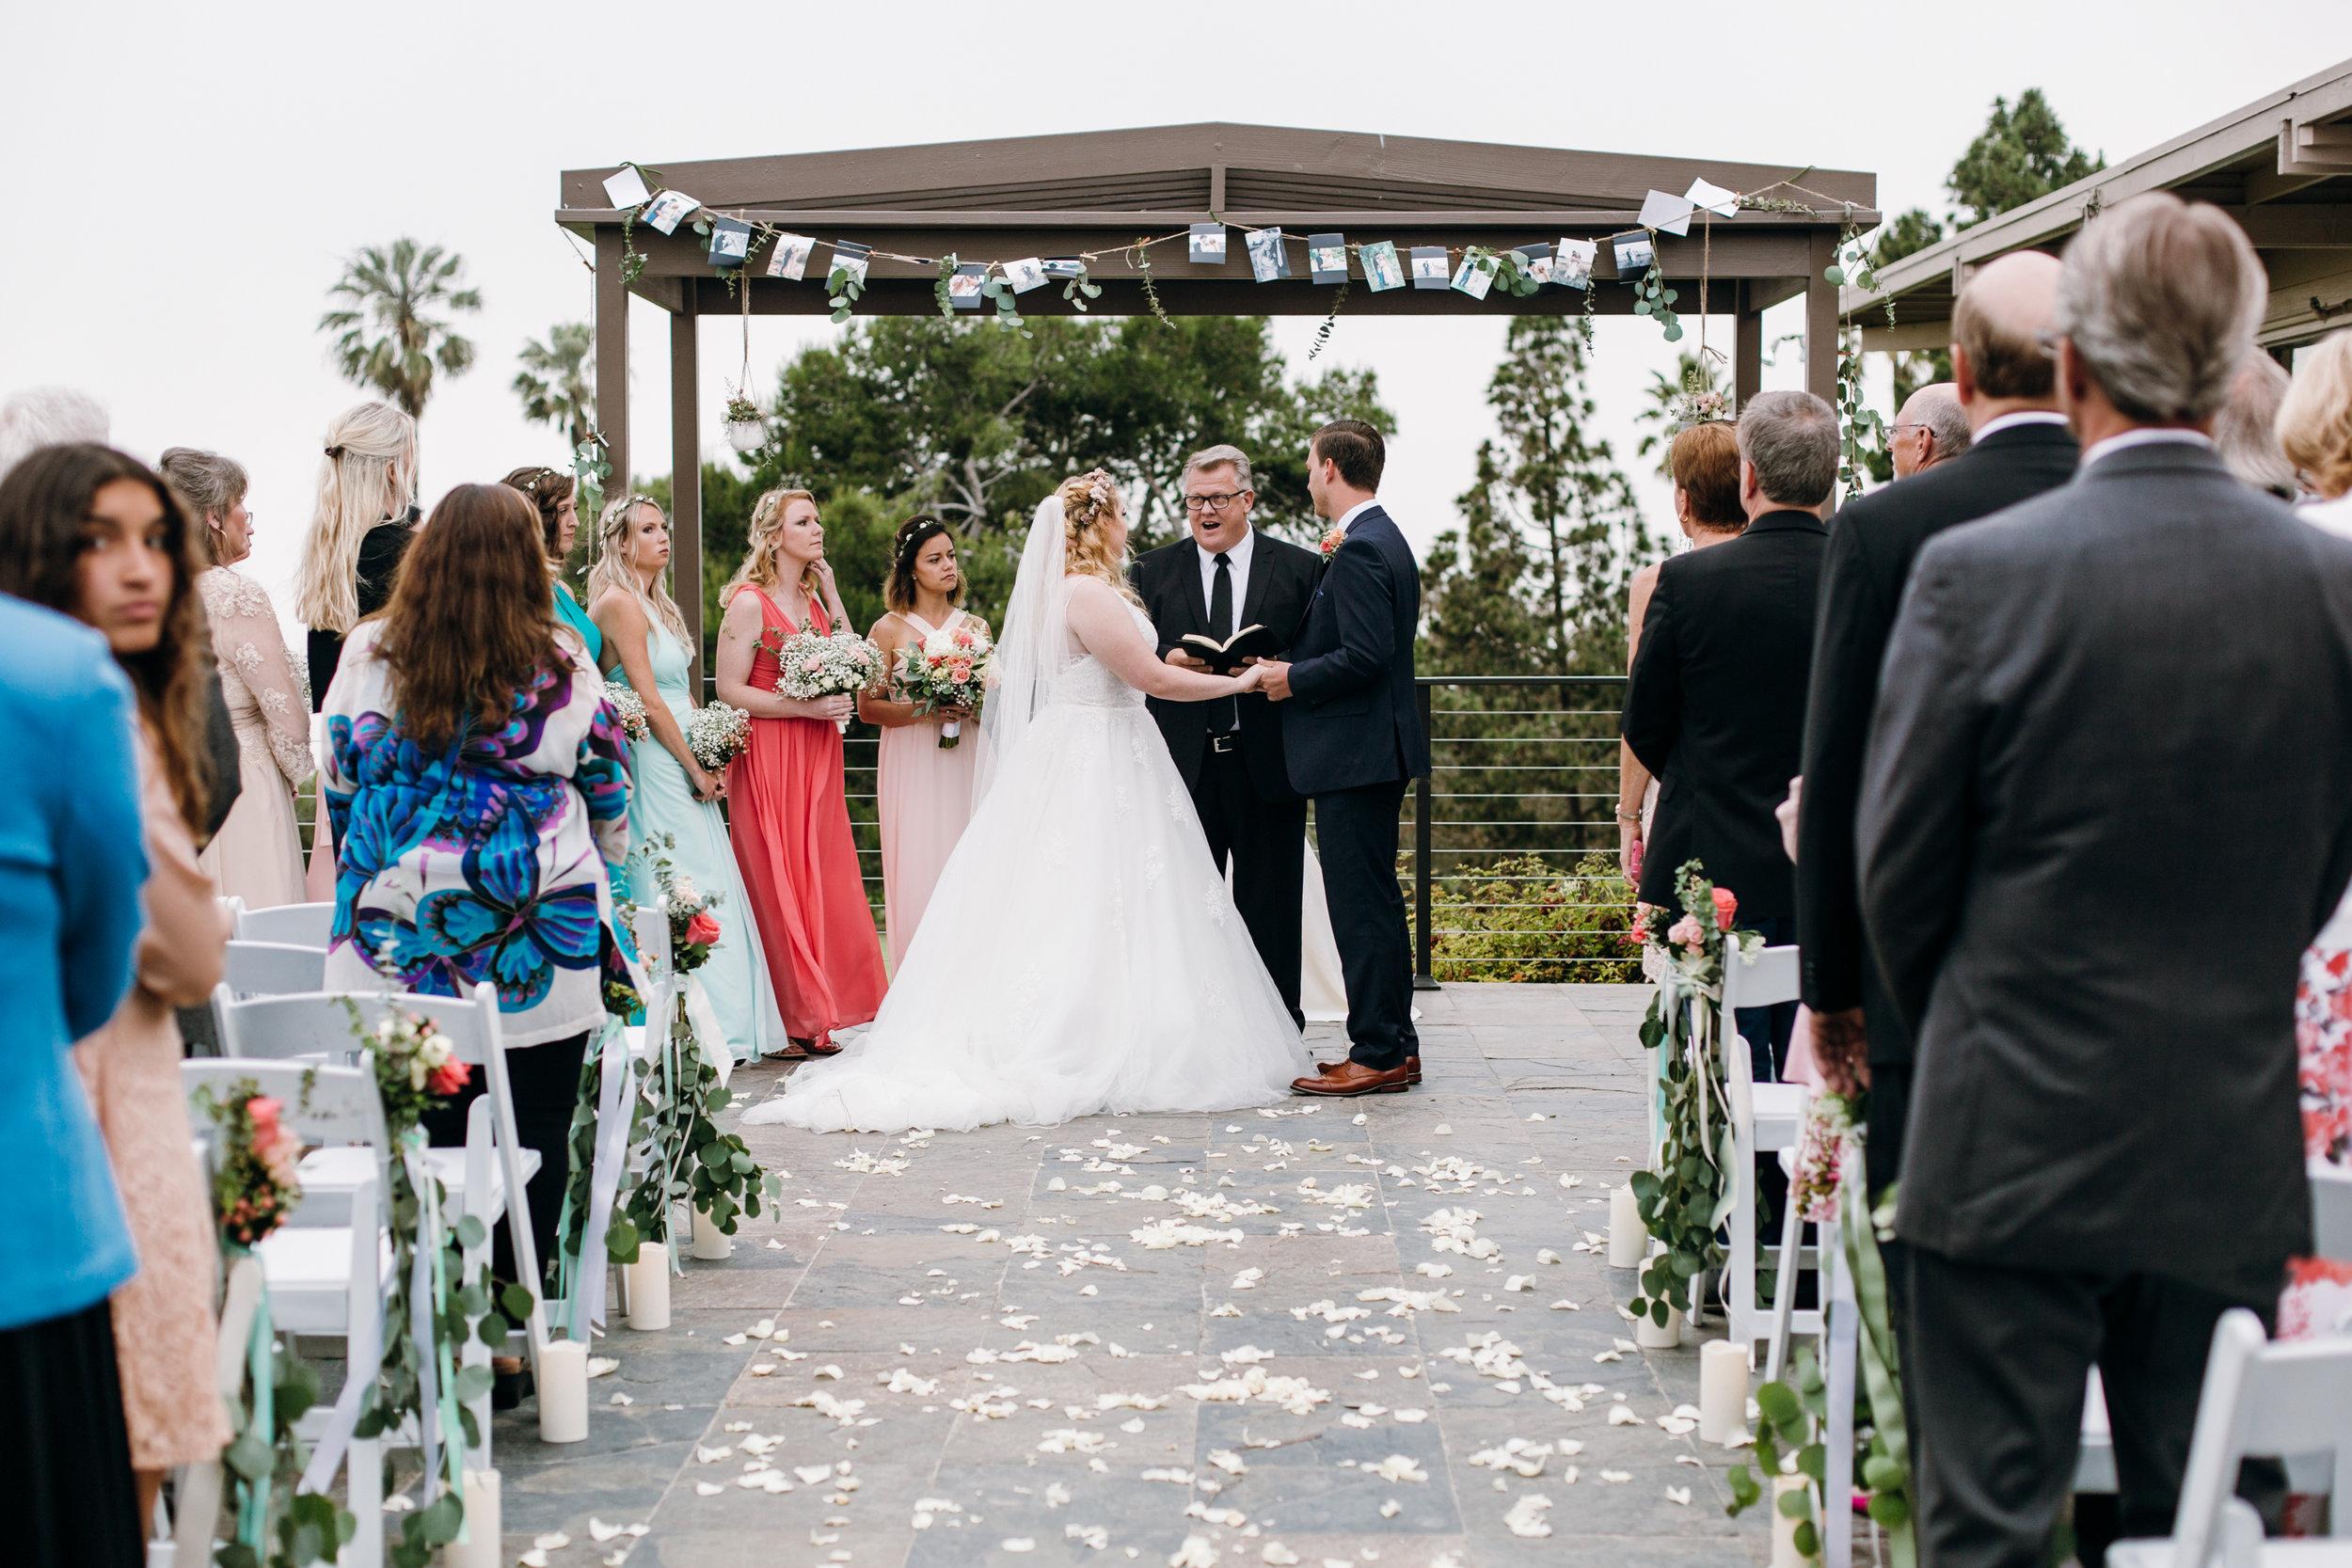 KaraNixonWeddings-PalosVerdes-Wedding-28.jpg